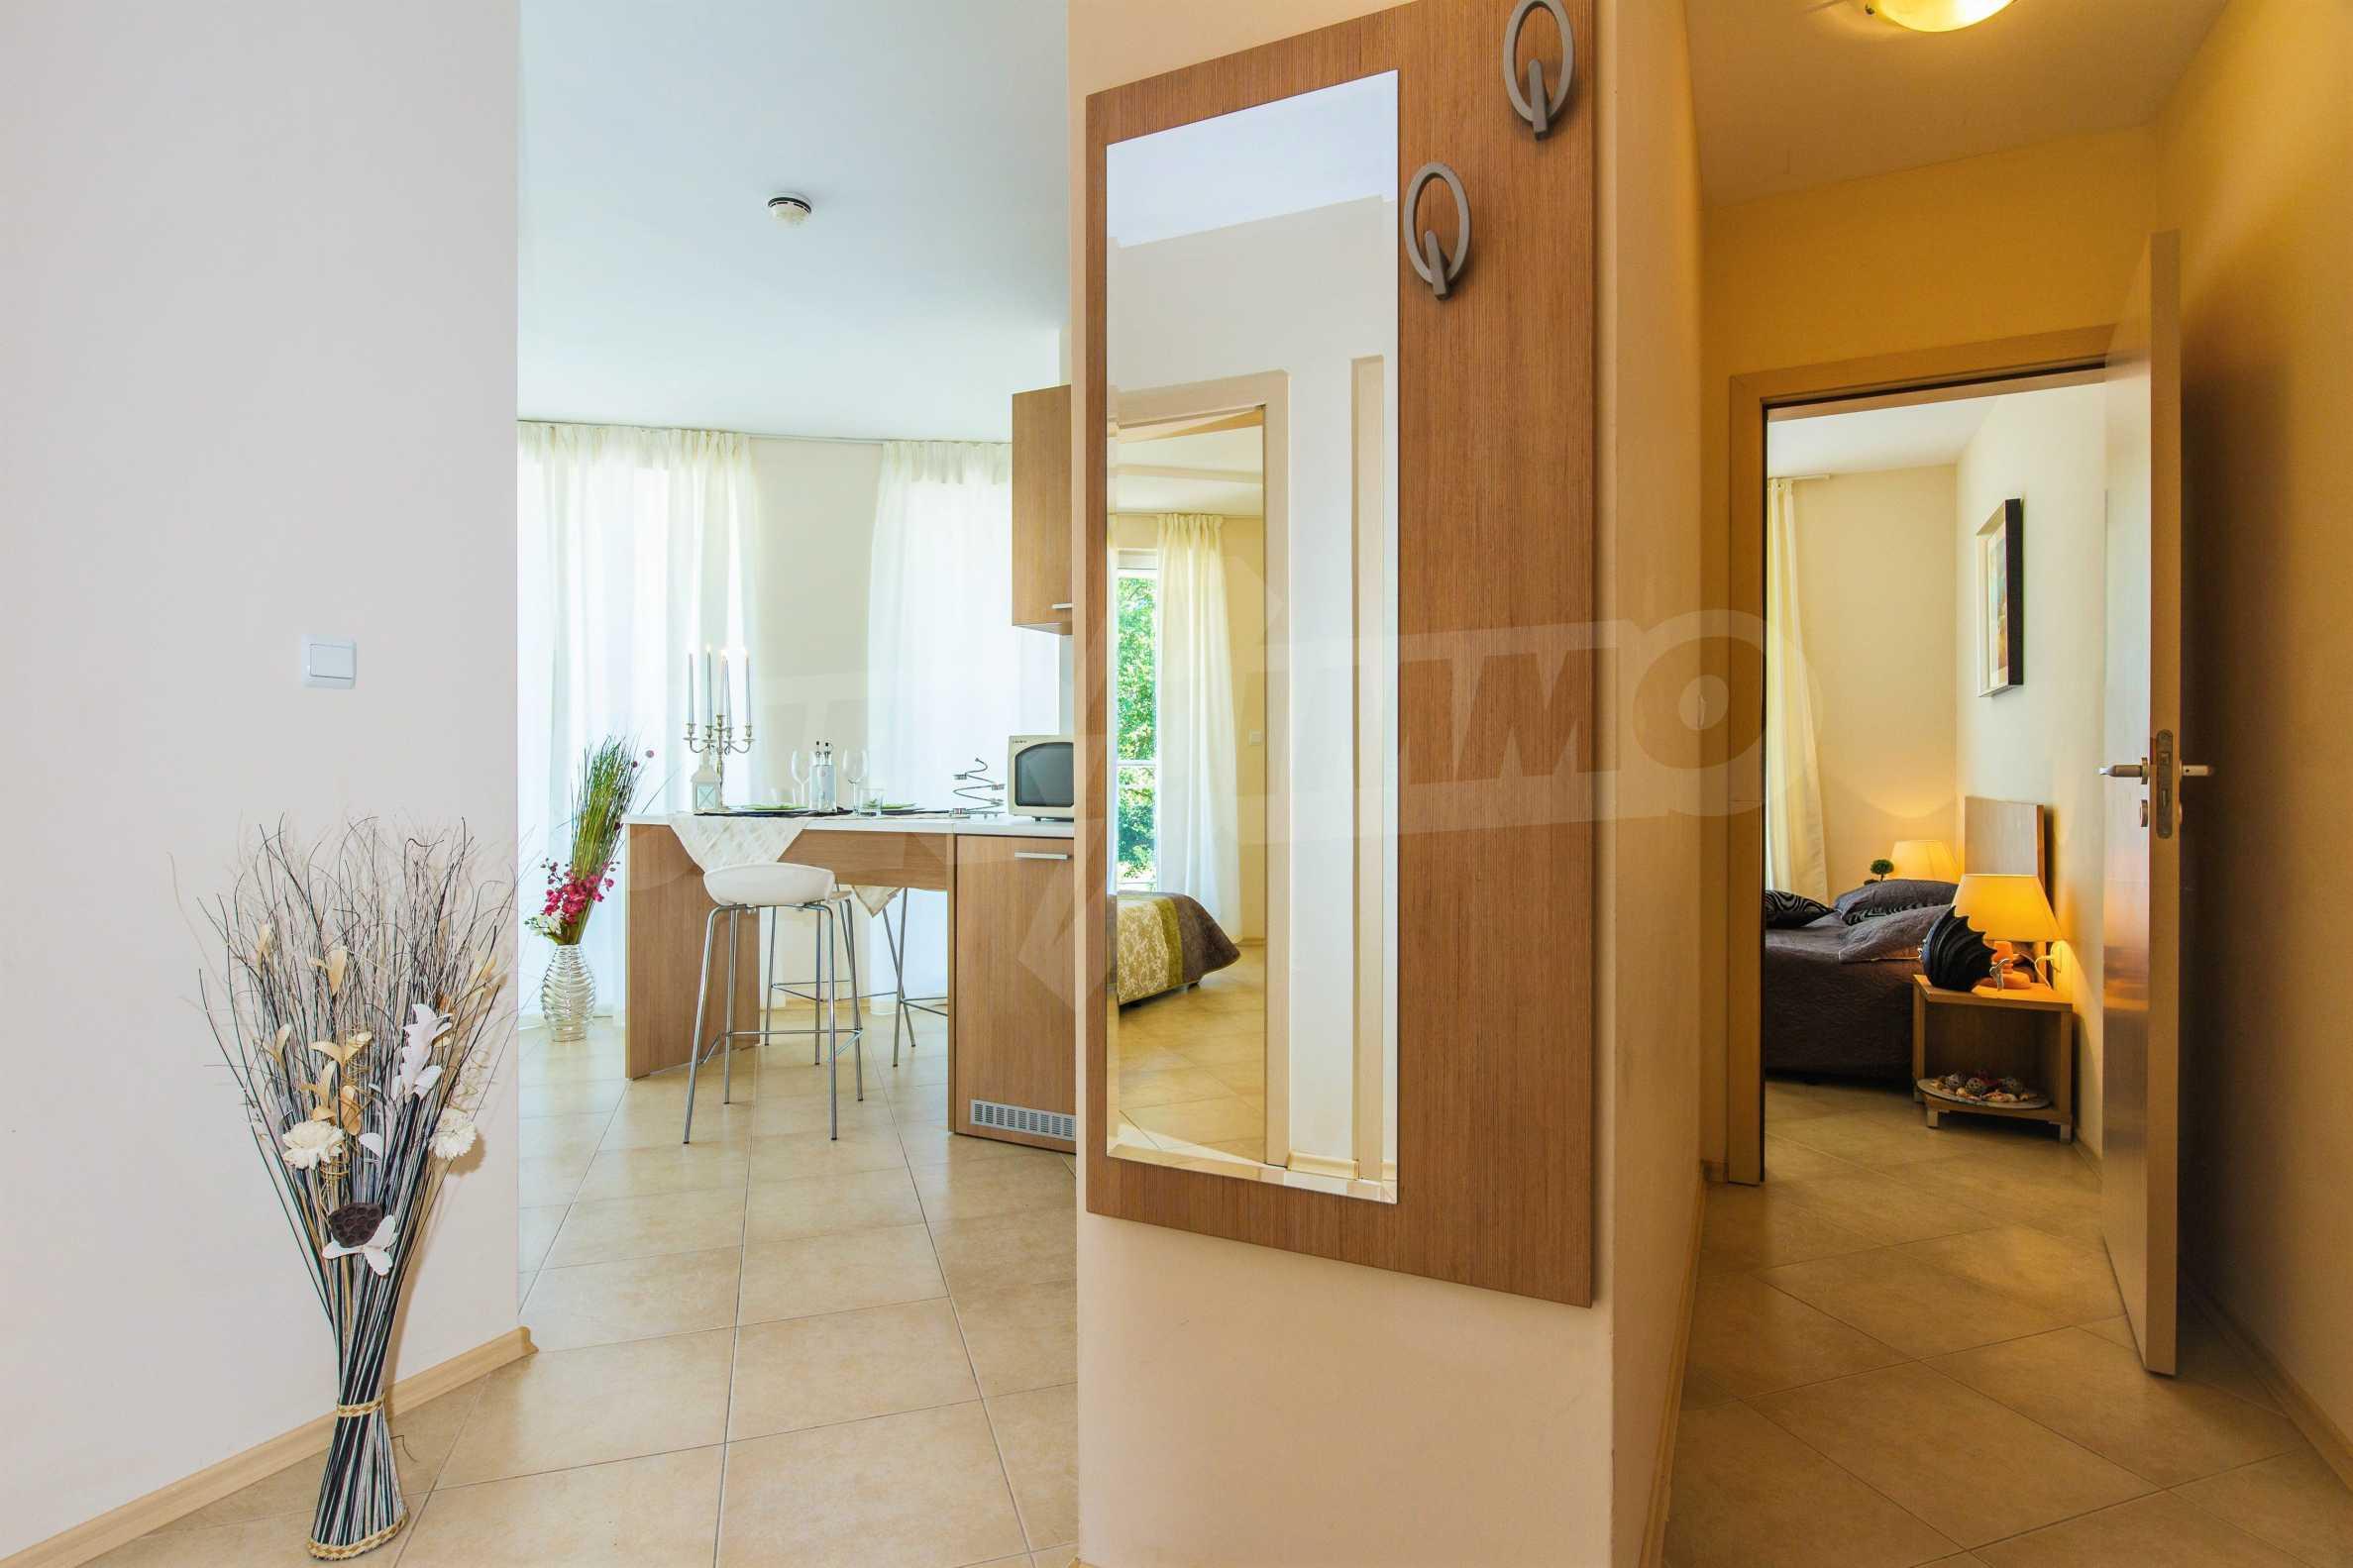 Тристаен апартамент в комплекс Емберли близо до плажа в Лозенец (ап. №423) 5